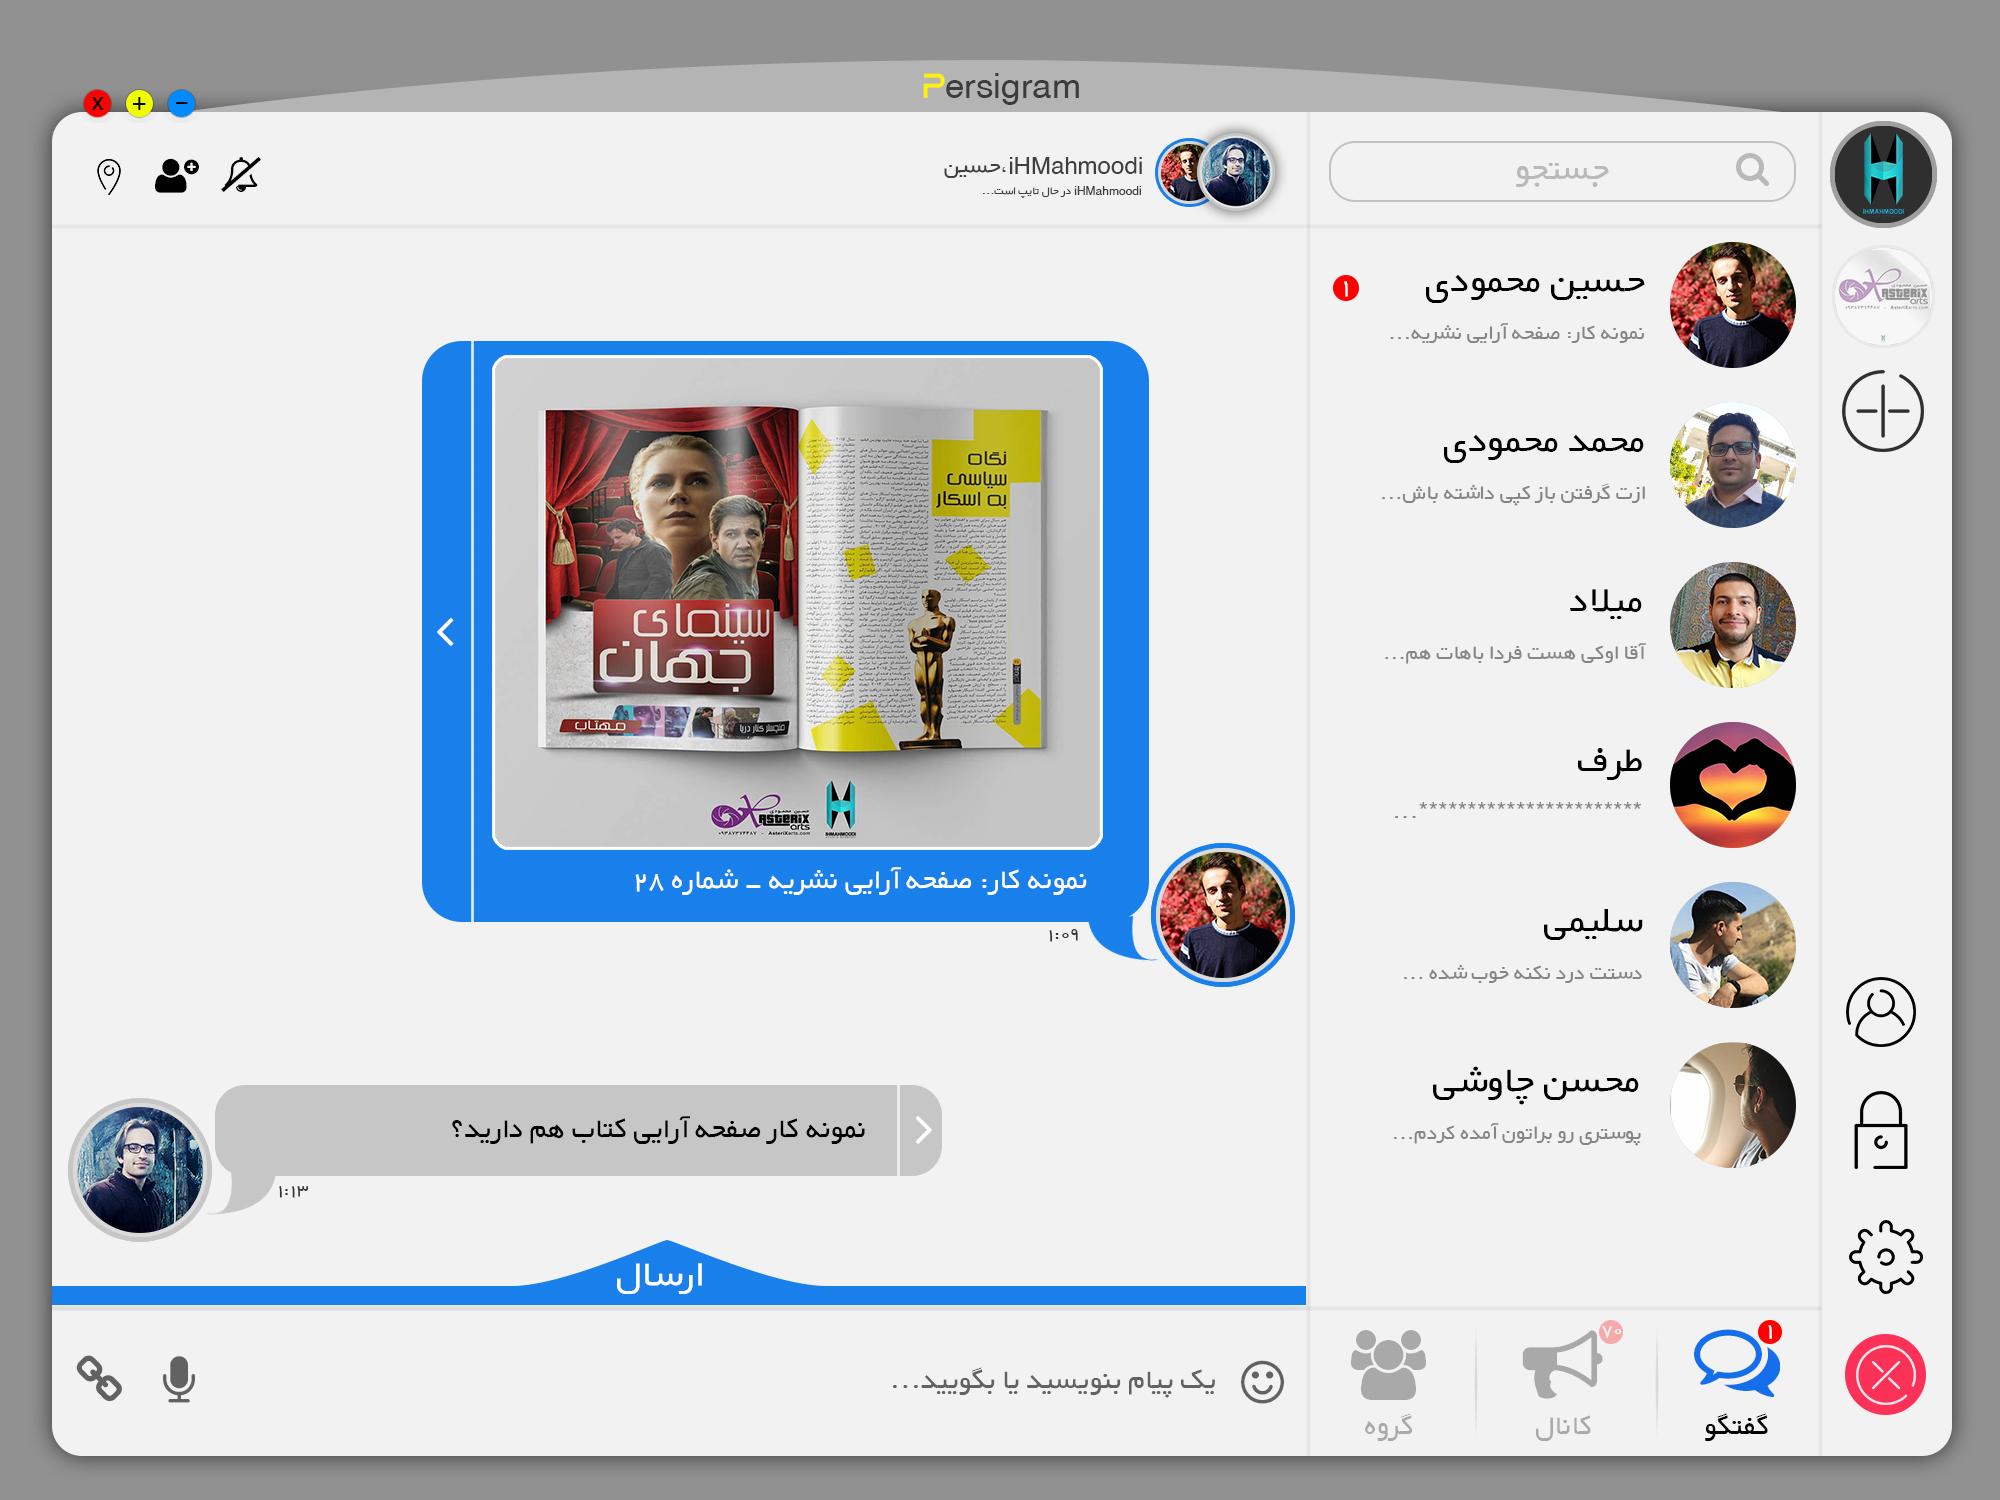 نمونه کار: طراحی رابط کاربری نرم افزار Direct Message